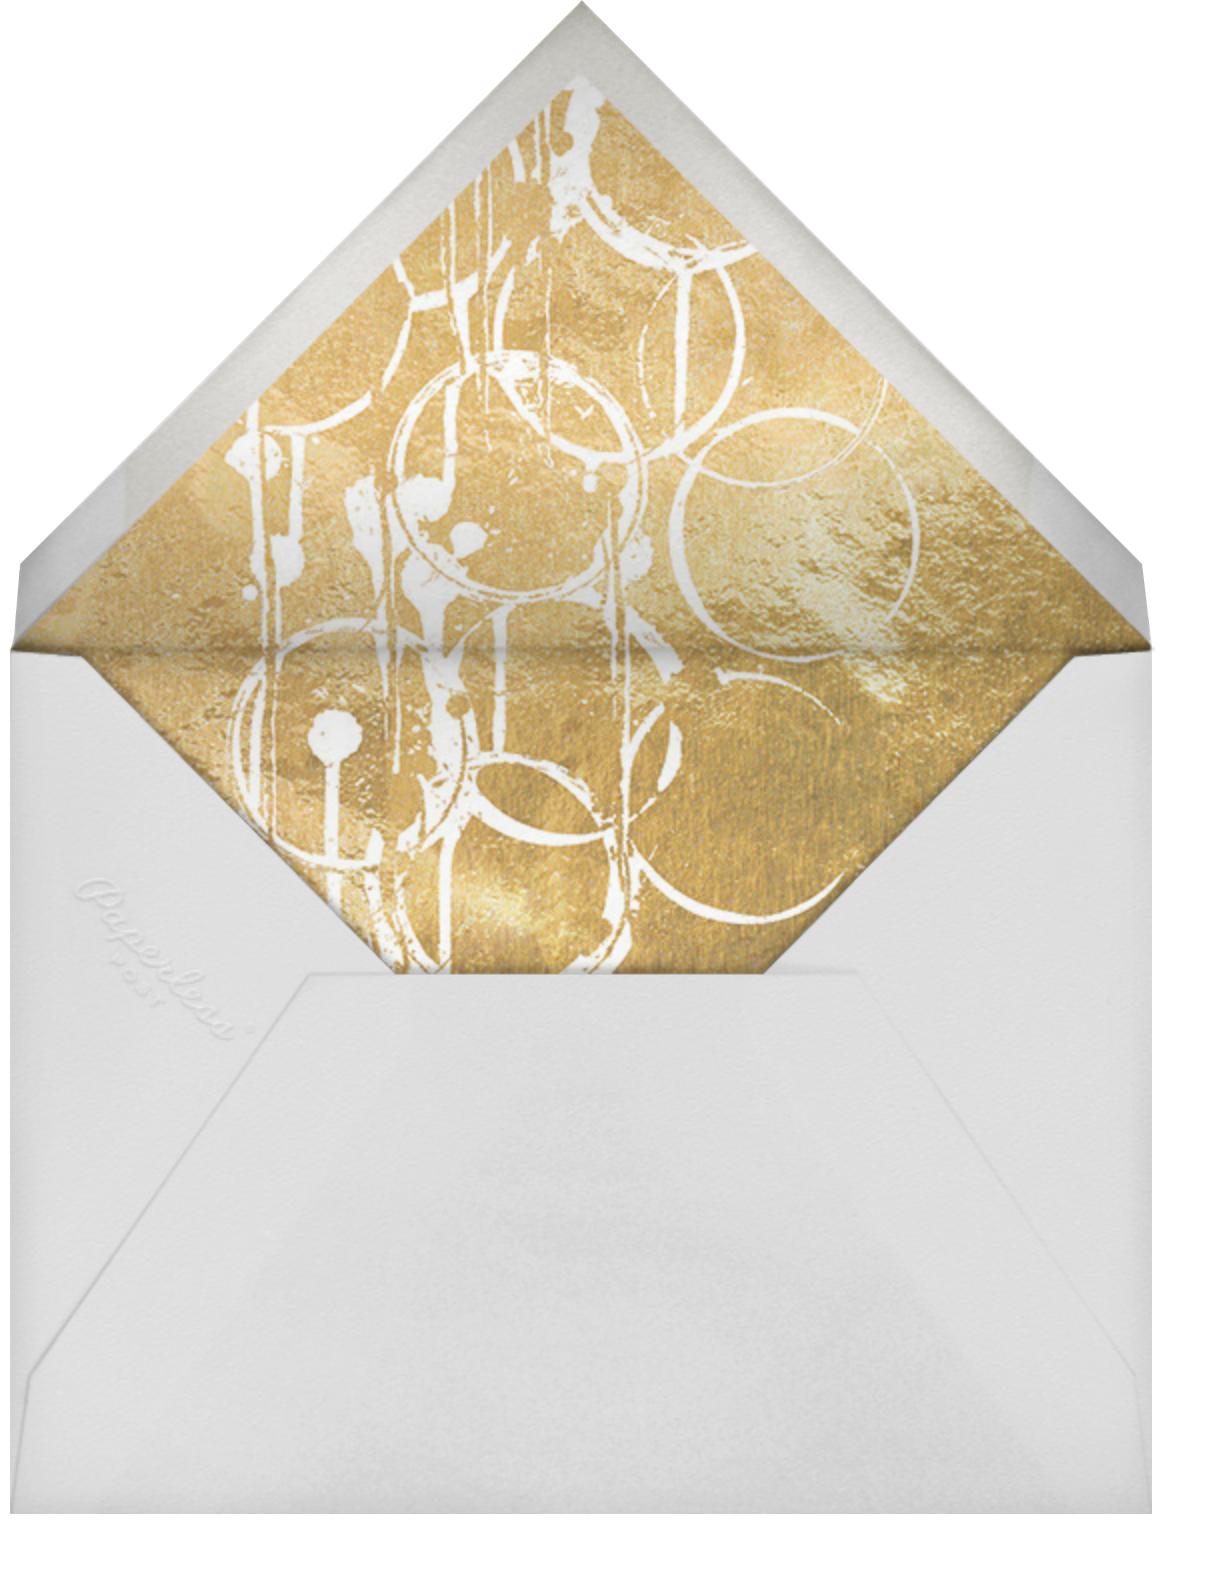 Bottle Shock - Gold - Kelly Wearstler - Graduation party - envelope back